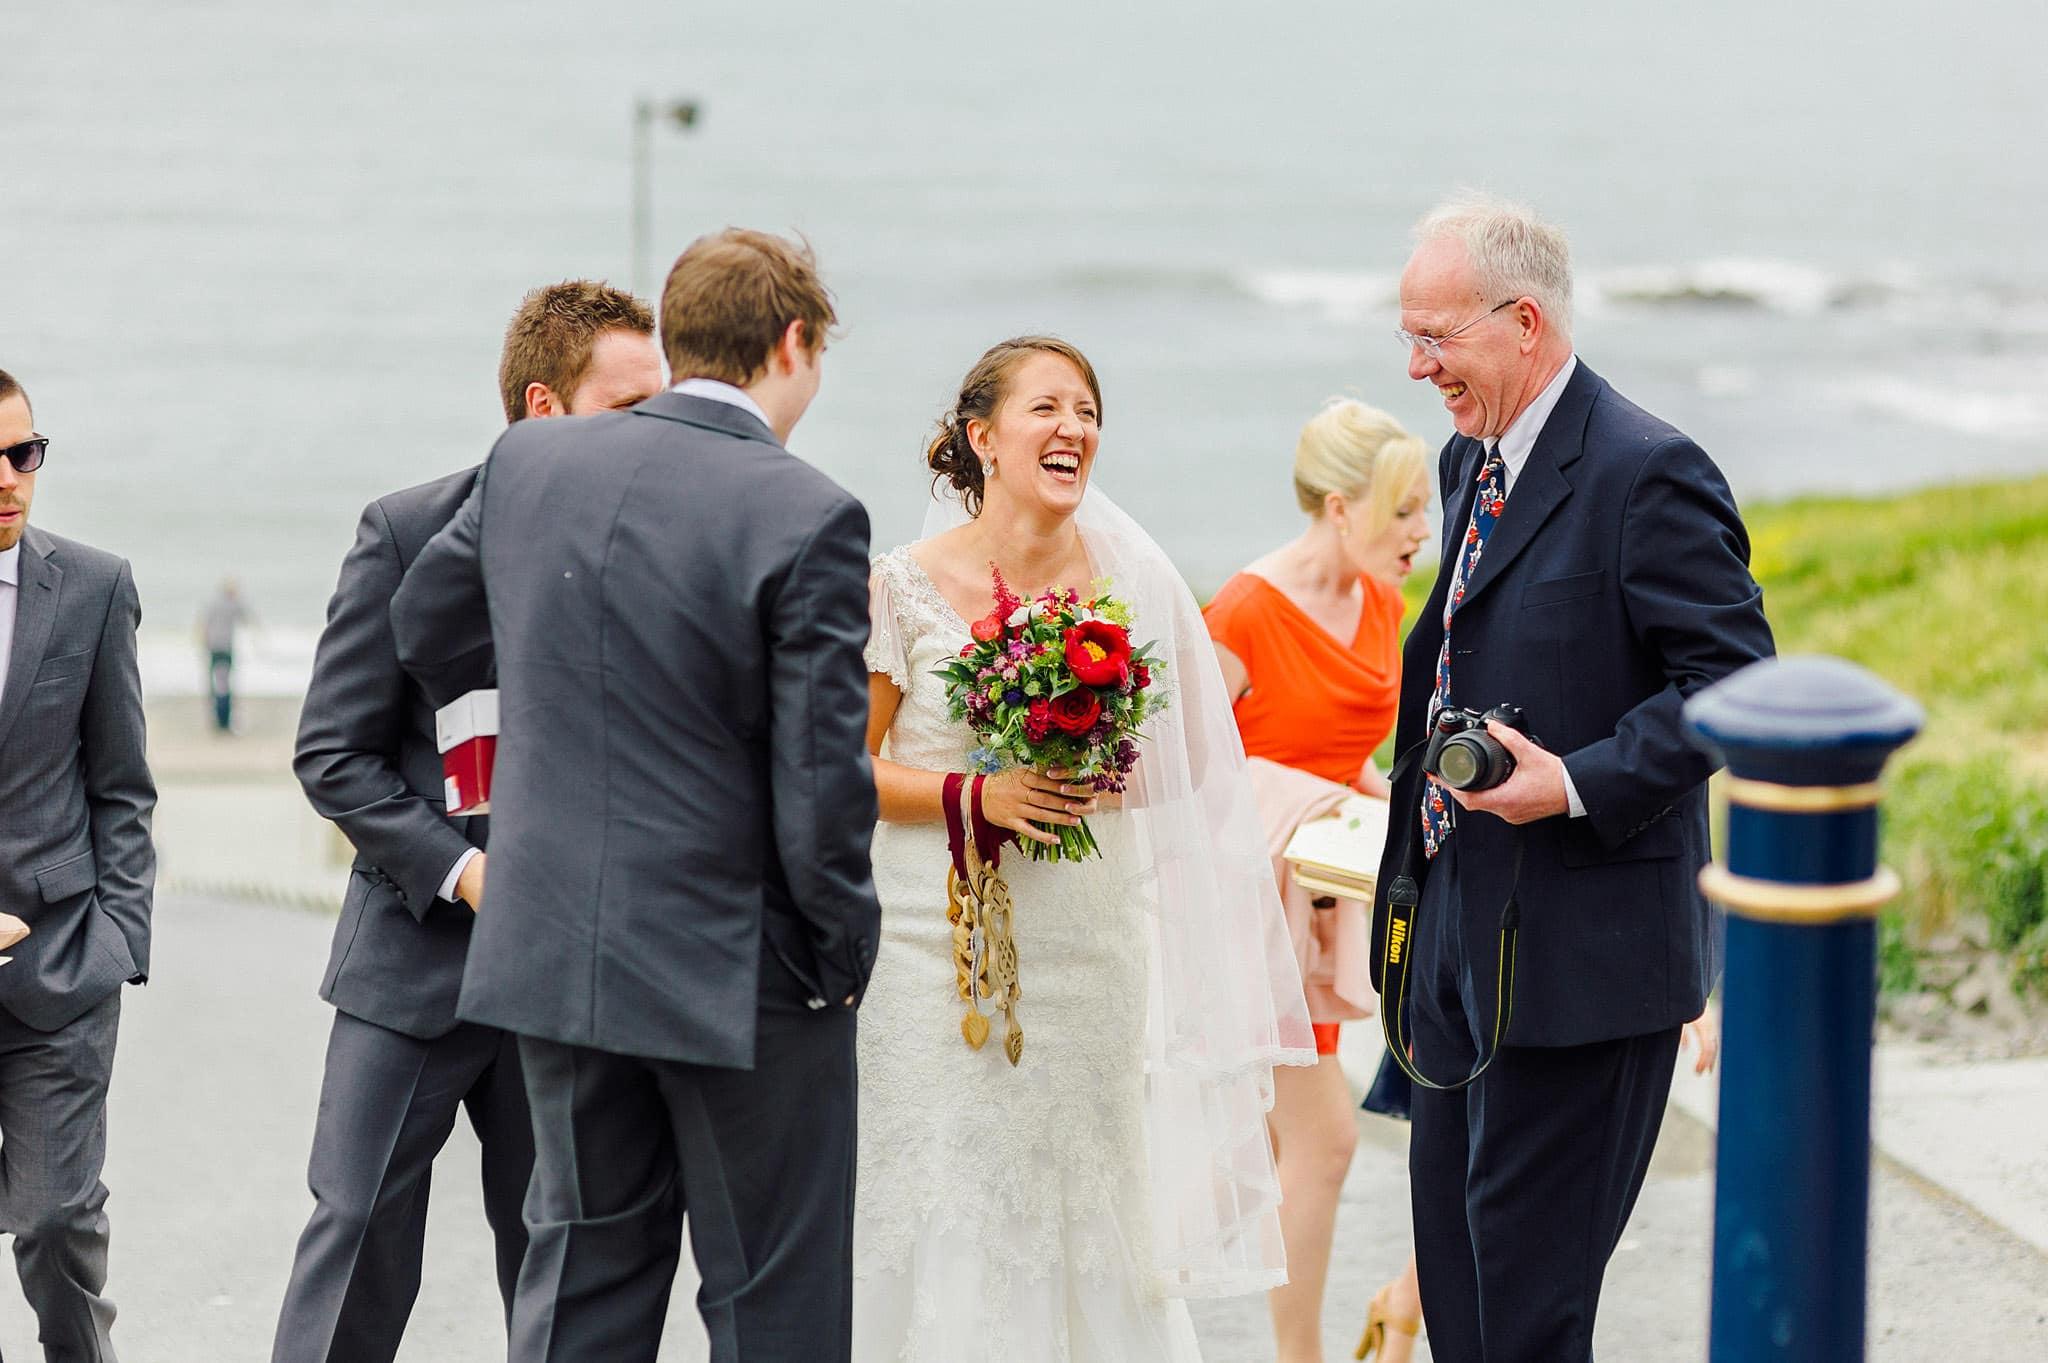 wedding-photographer-aberystwyth-wales (111)